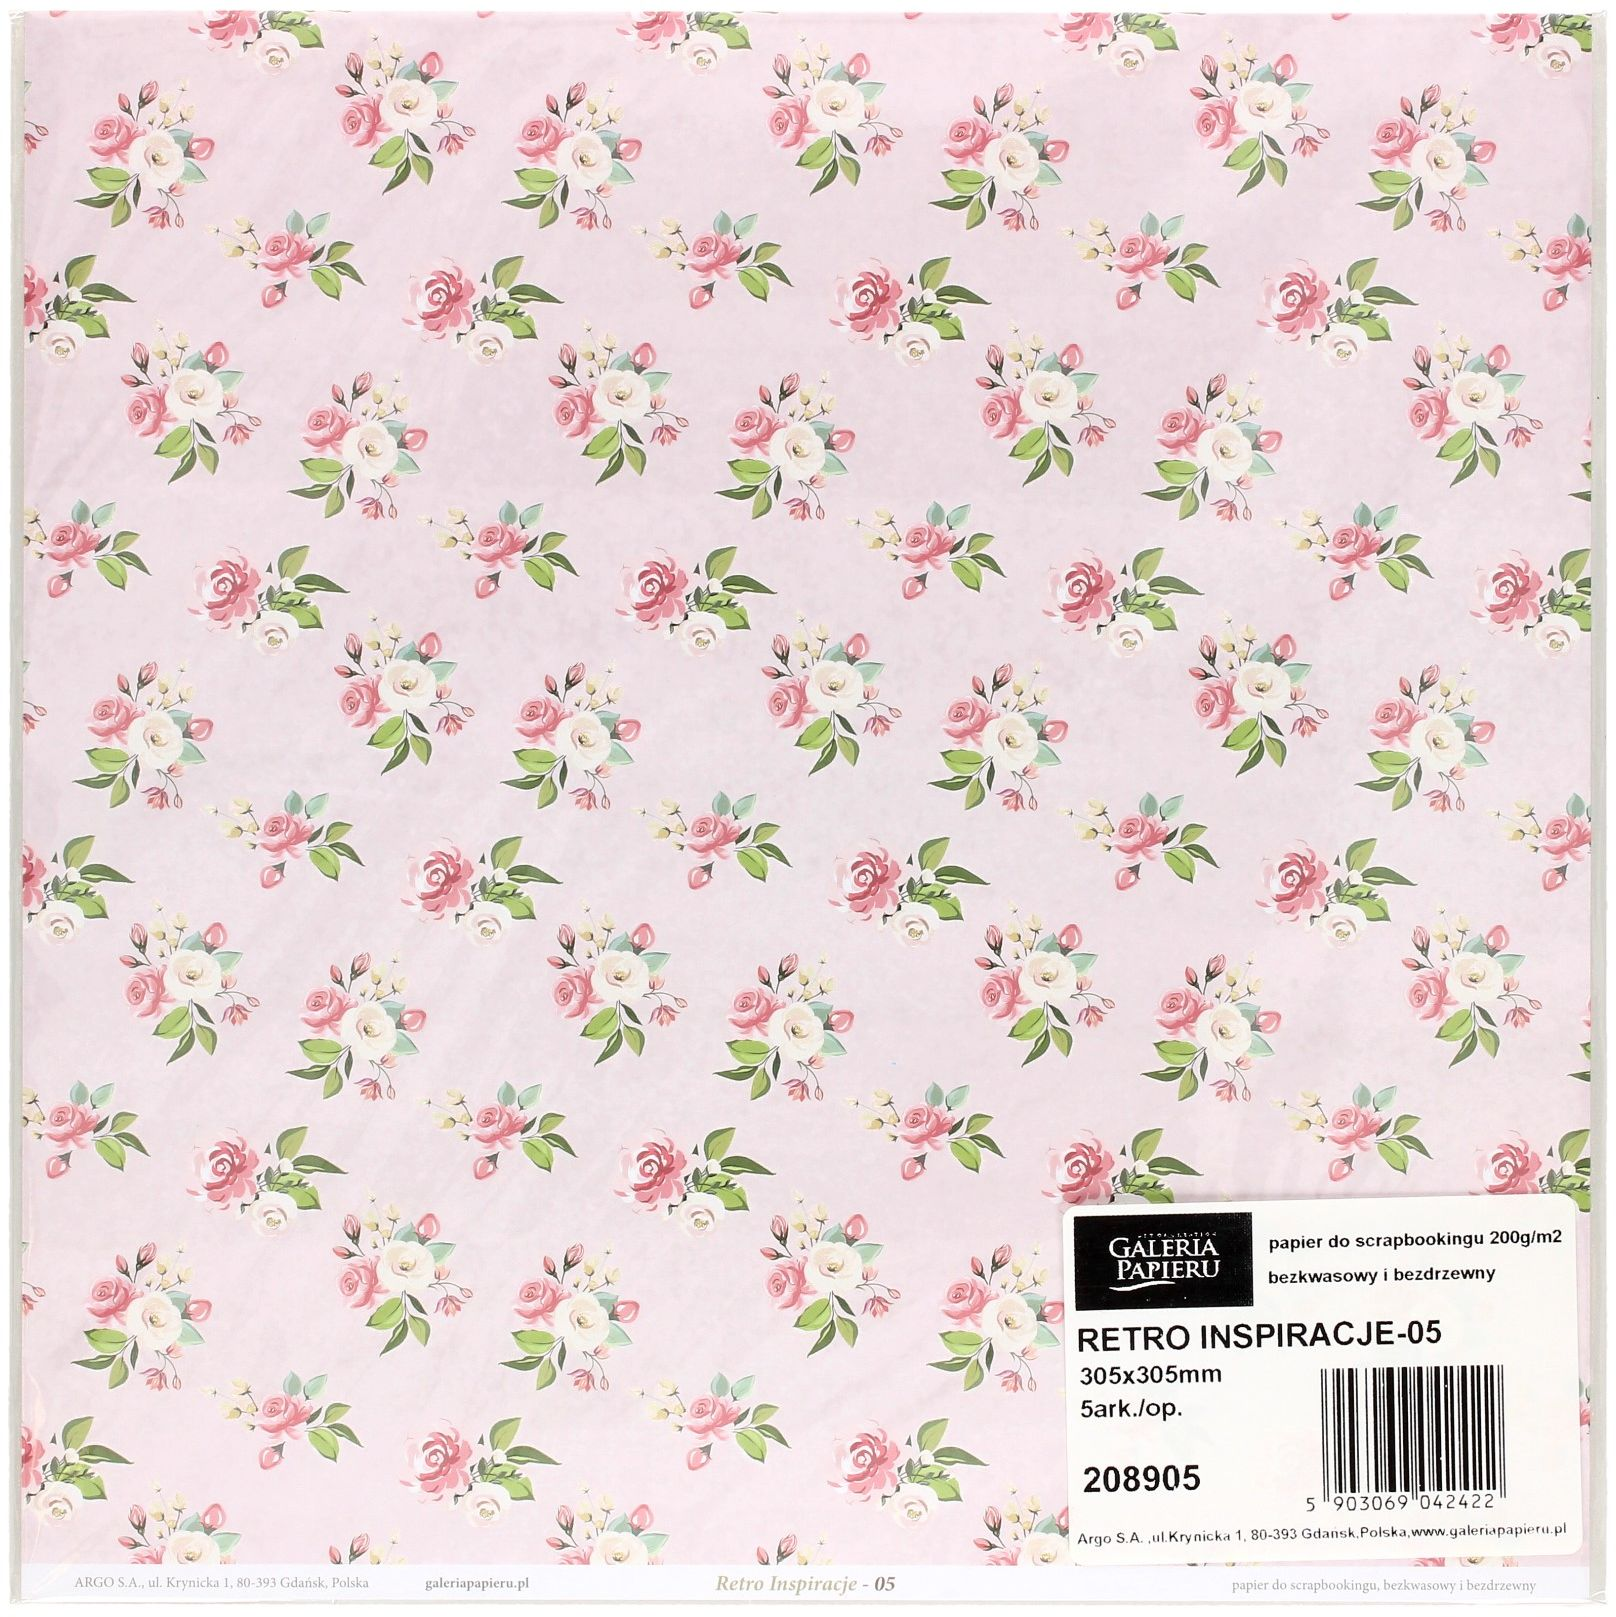 Papier scrapbooking 305x305 Retro Inspiracje/05 (5)